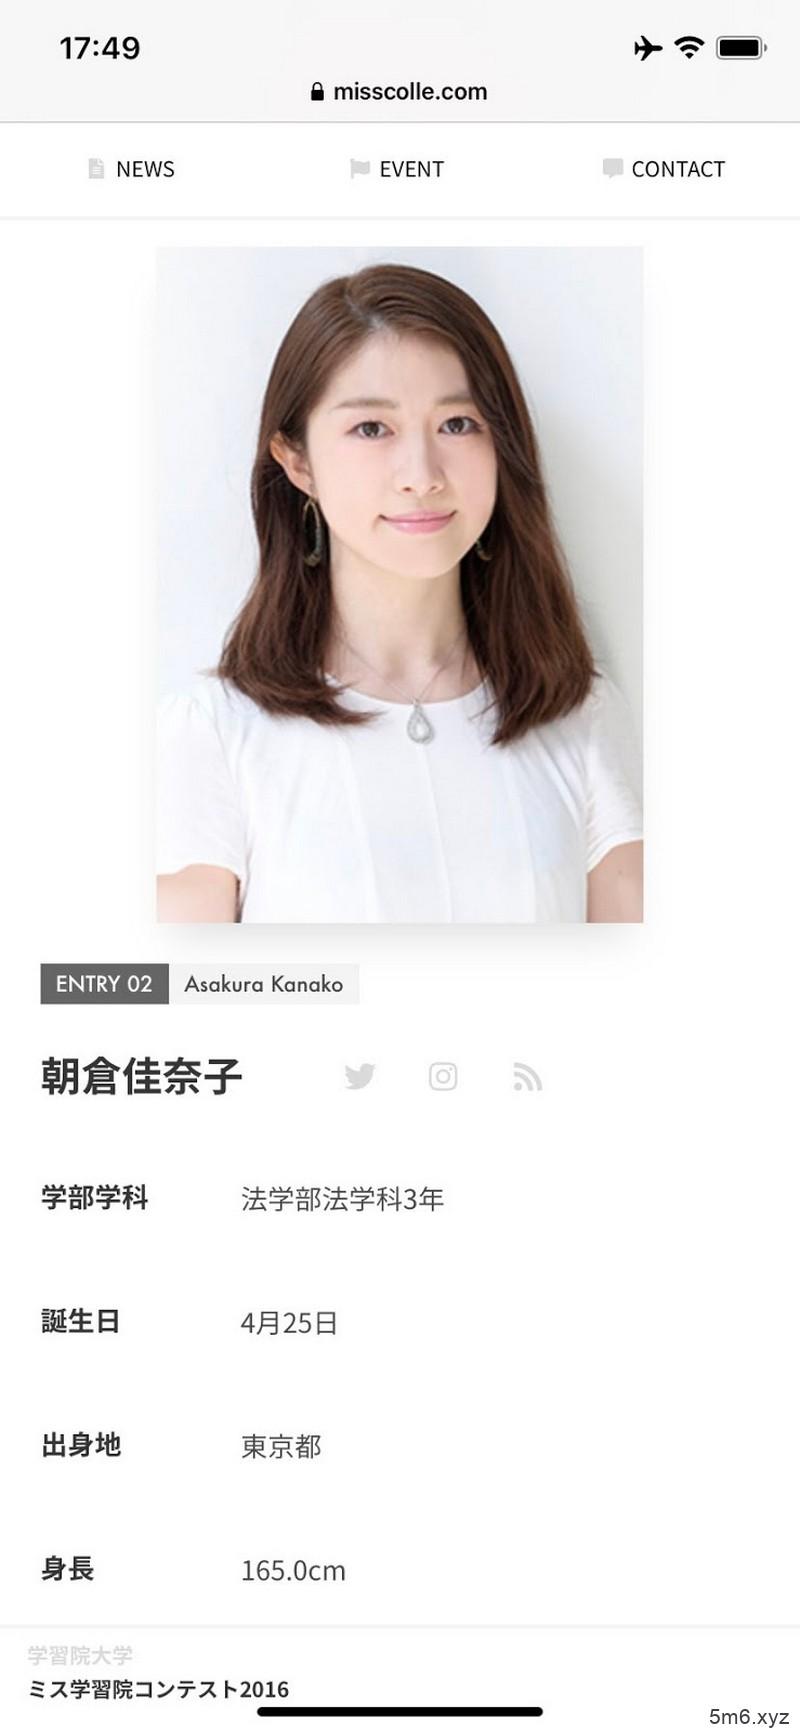 【捕鱼王】结城るみな(结城瑠美奈):下海是对前男友的复仇!